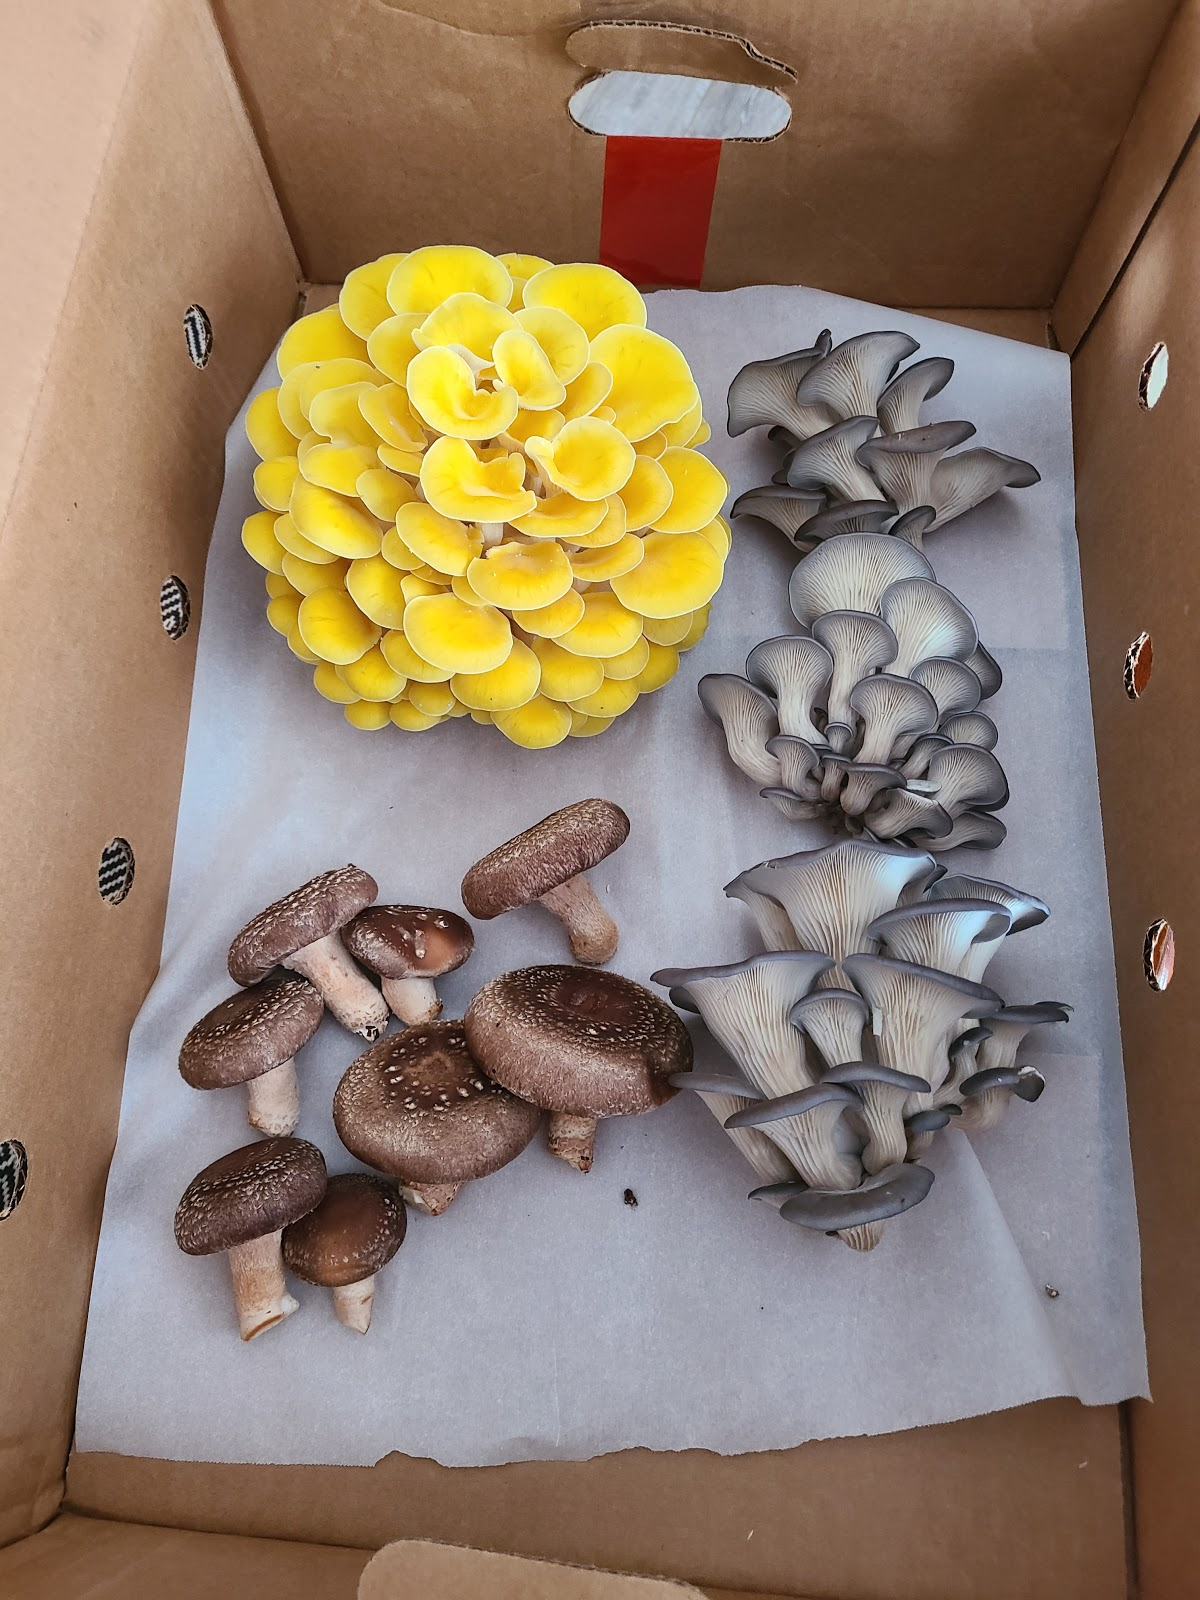 Gourmet Mushroom Share